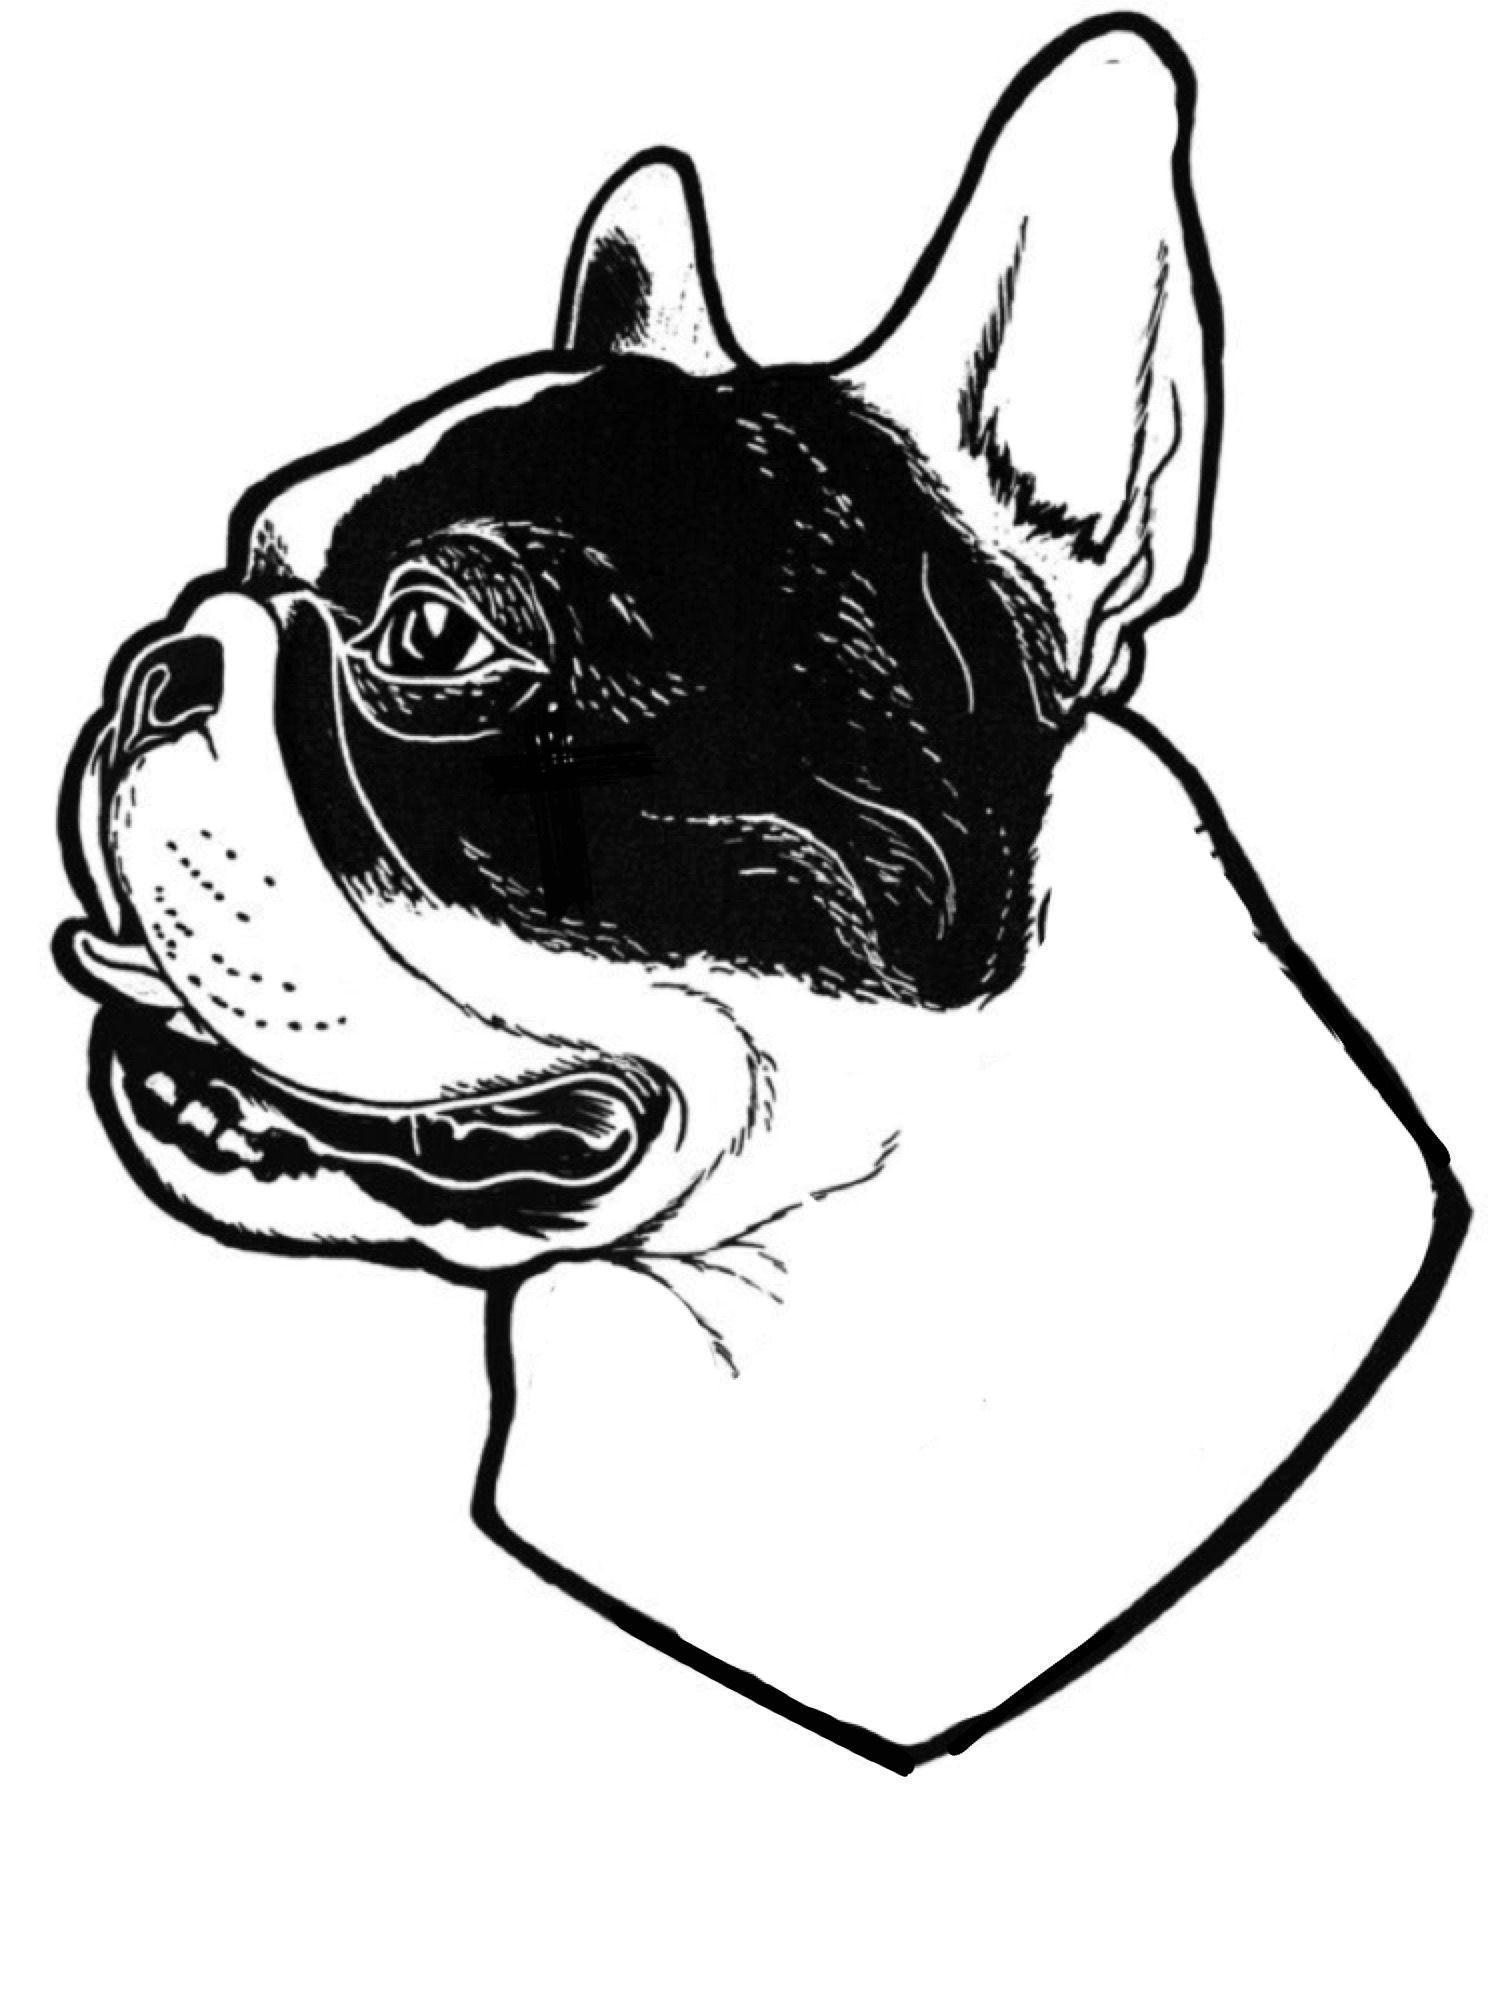 French Bulldog Illustration Tattoo Stencil Buldog Franse Buldog Buldog Franse Bulldog